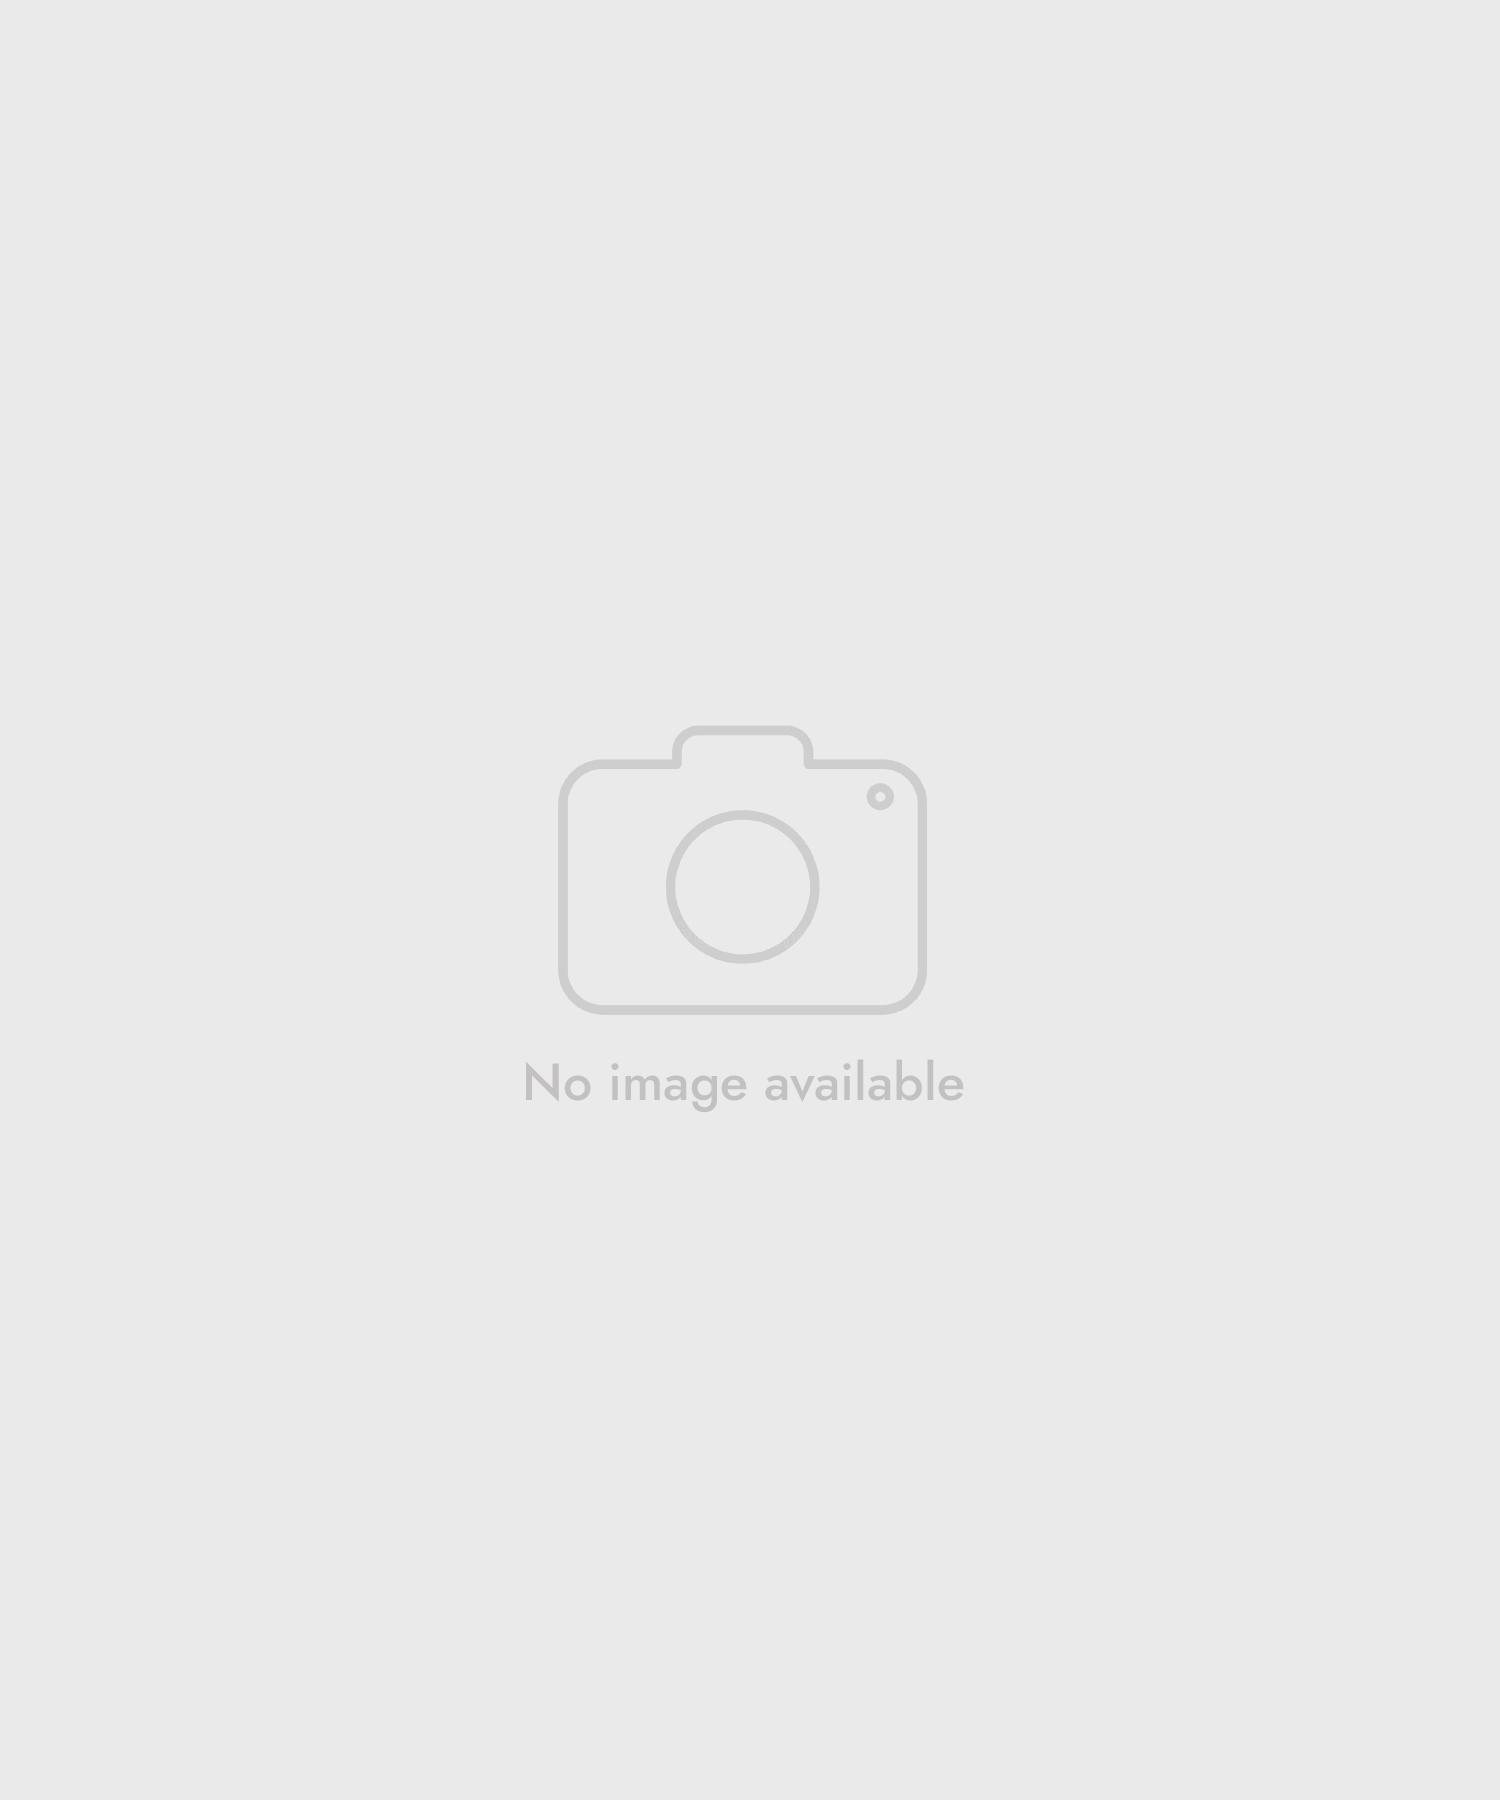 Beżowa torebka damska CDA-GER KS155